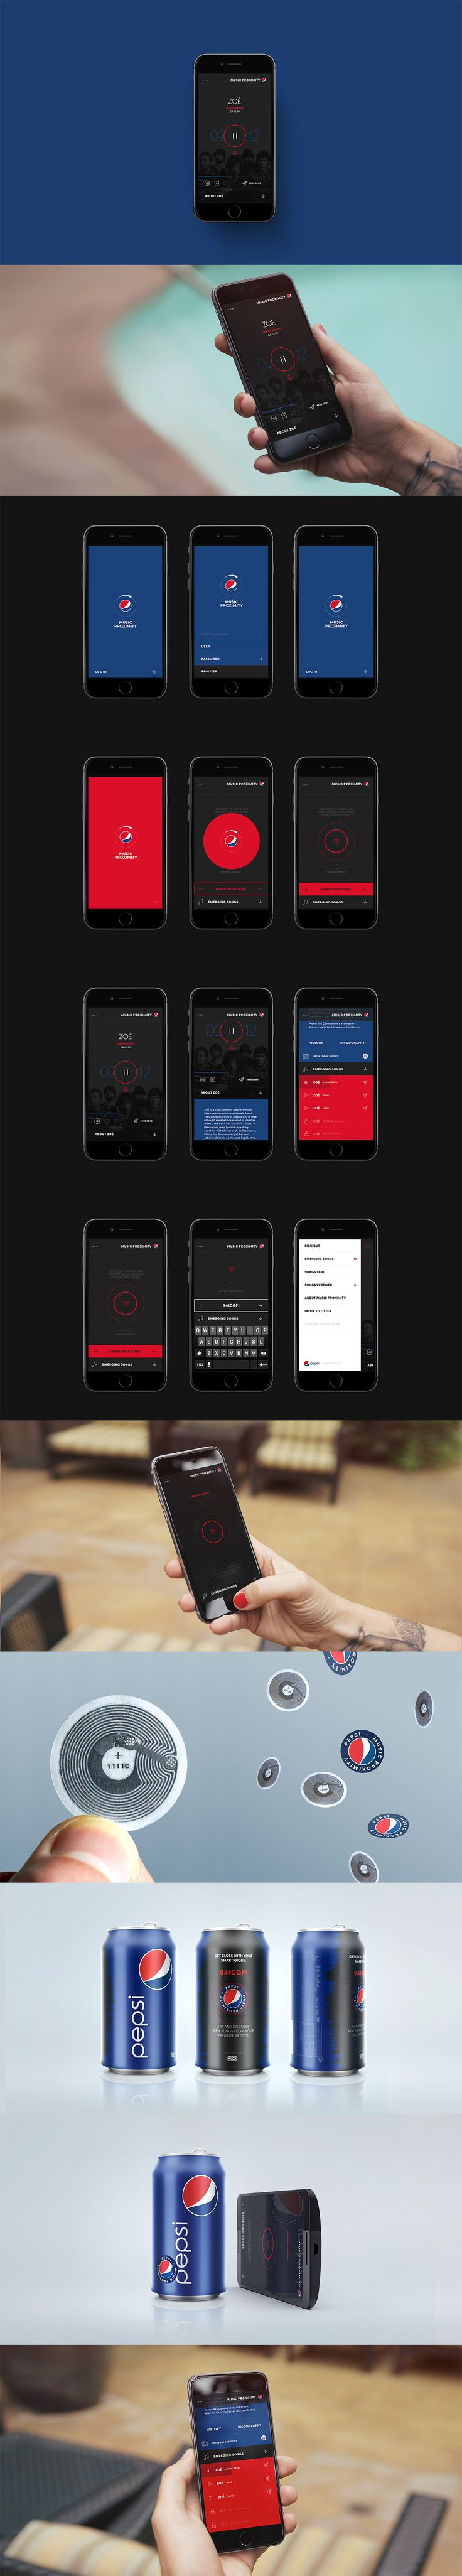 Pepsi Music Proximity App by Donhkoland #Design #App #InteractionDesign #UI #Application #Pepsi #Blue #Branding #Music #MusicApp